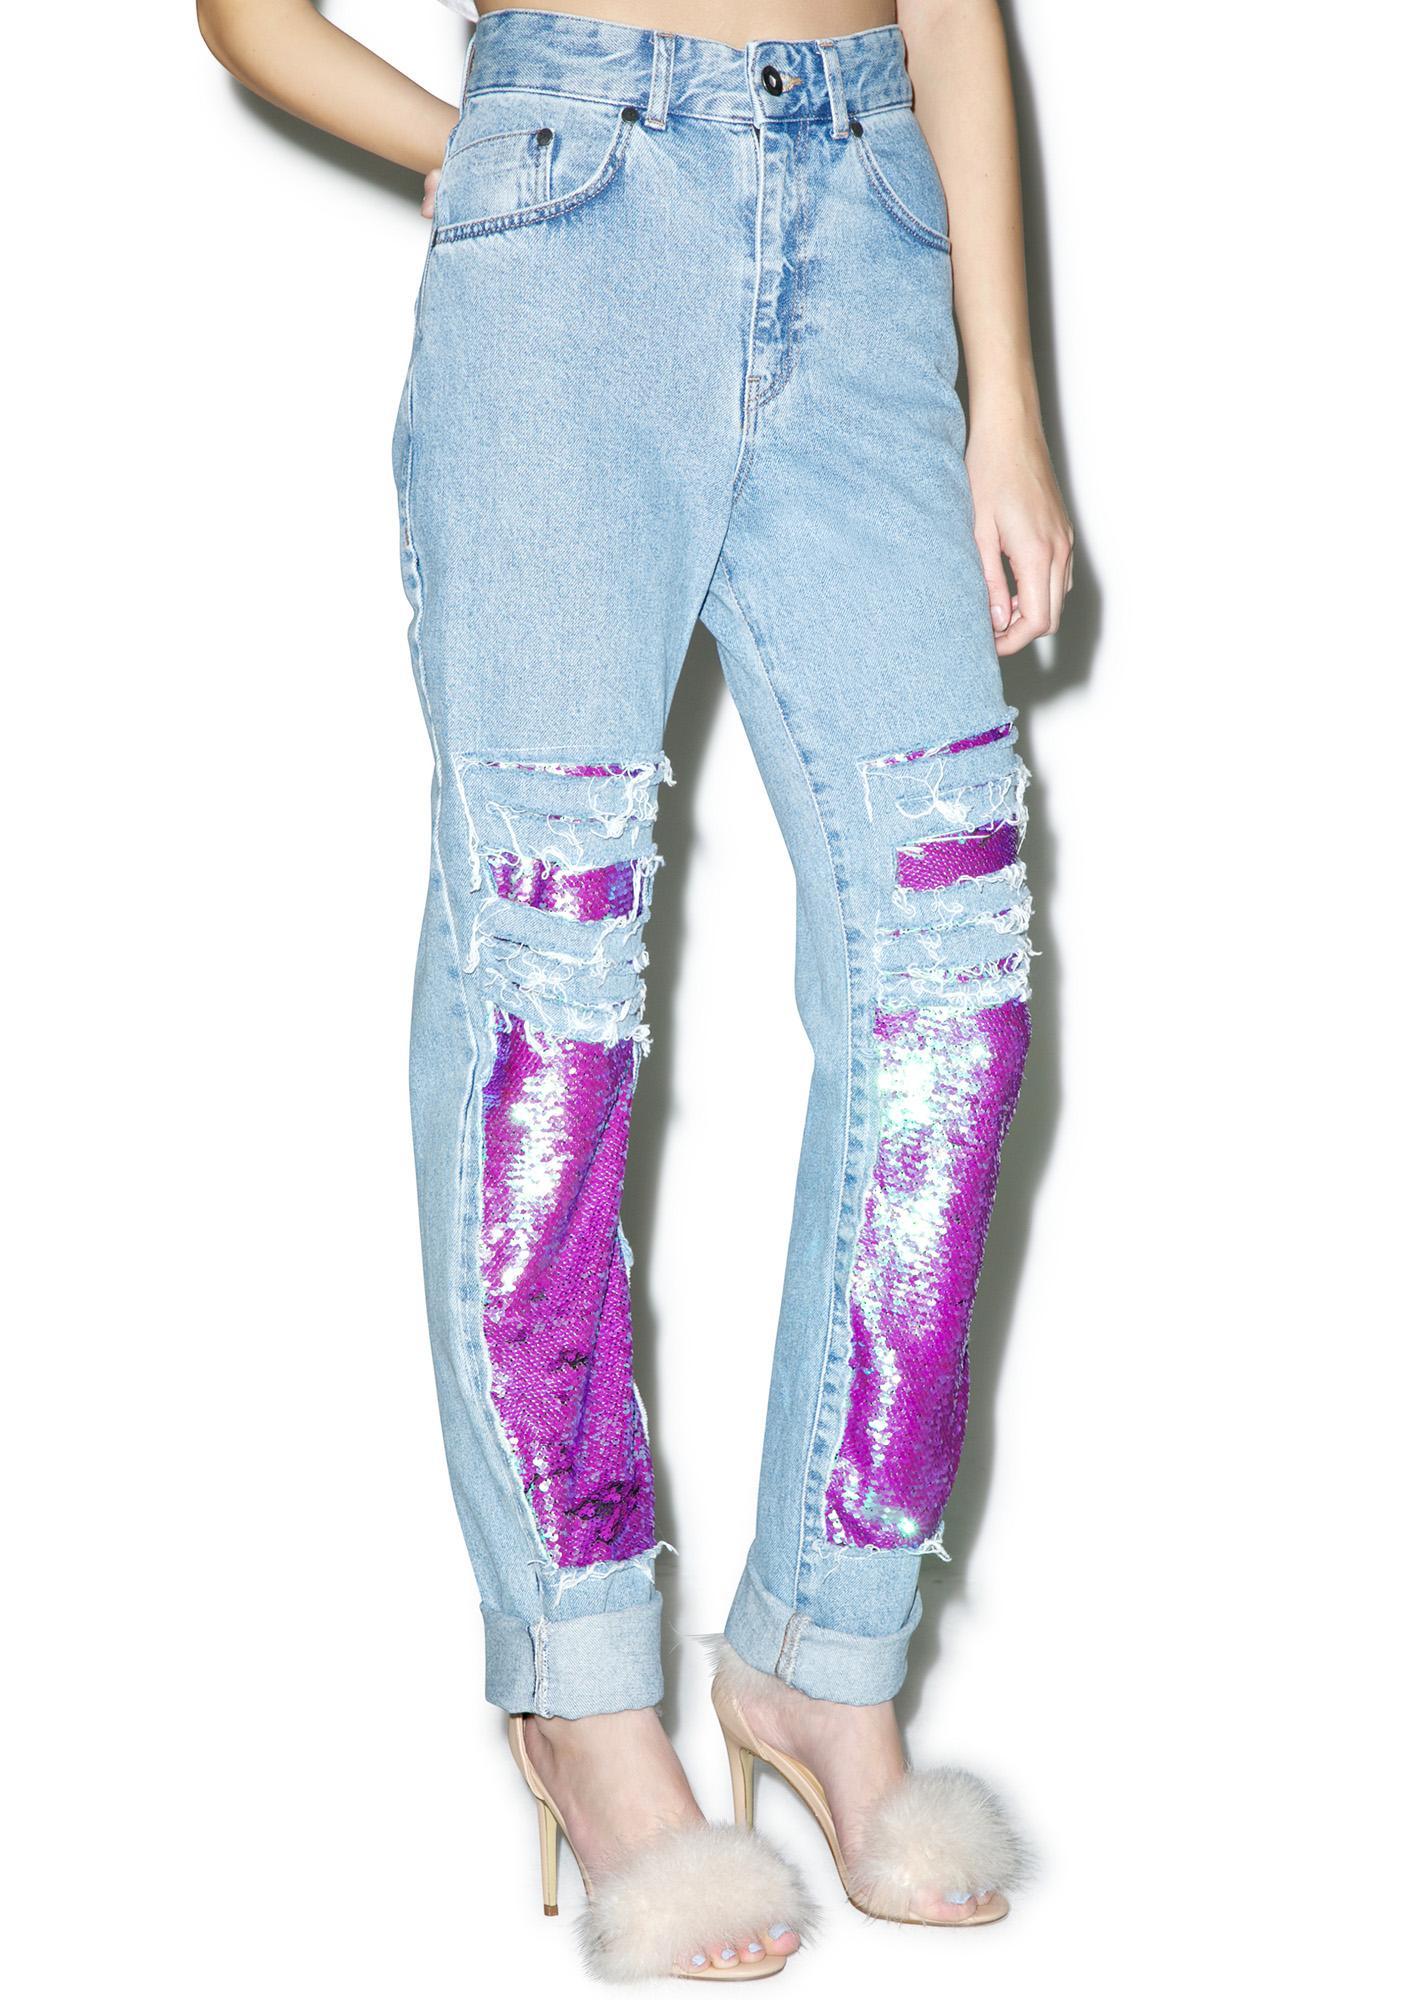 The Ragged Priest Gleam Mom Jeans